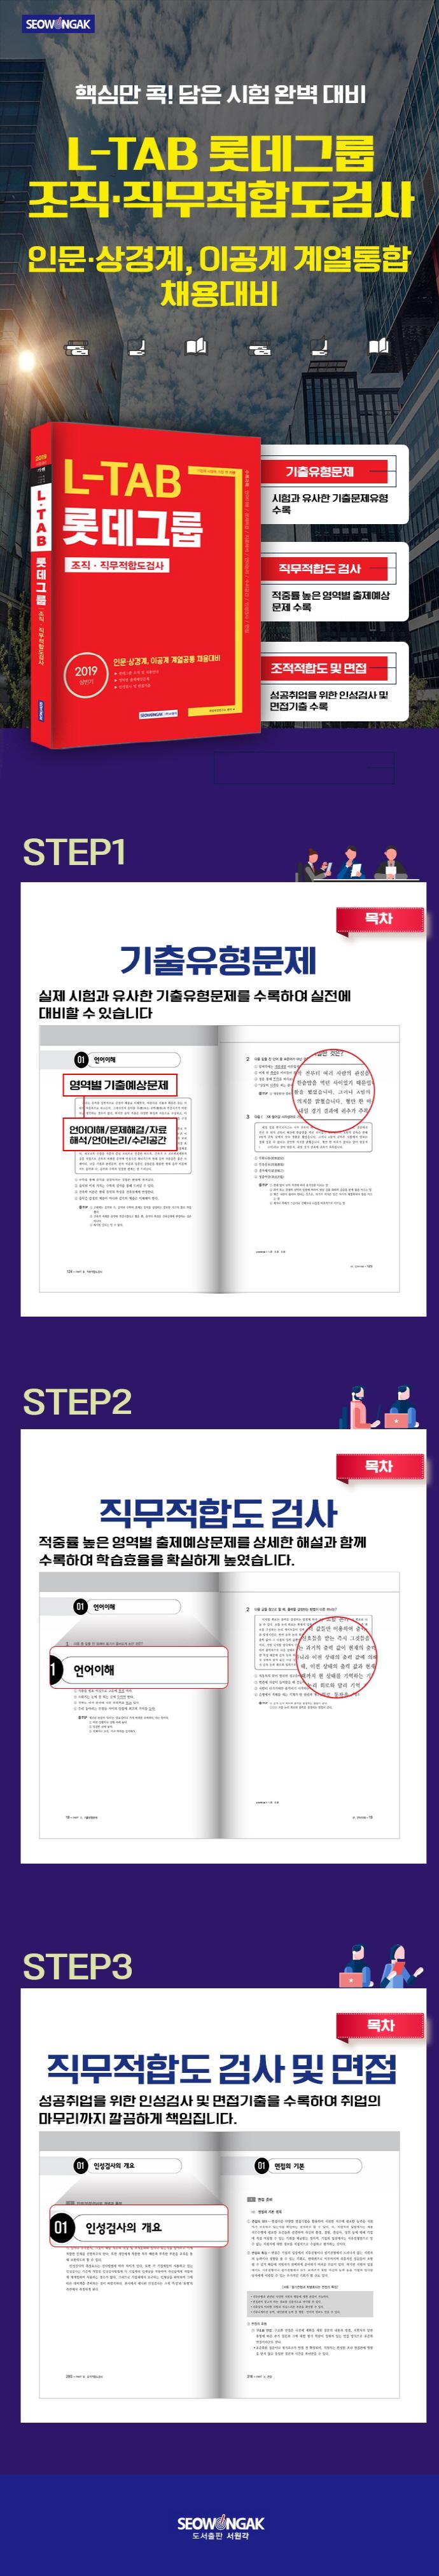 L-TAB 롯데그룹 조직 직무적합도검사(2019)(기쎈) 도서 상세이미지